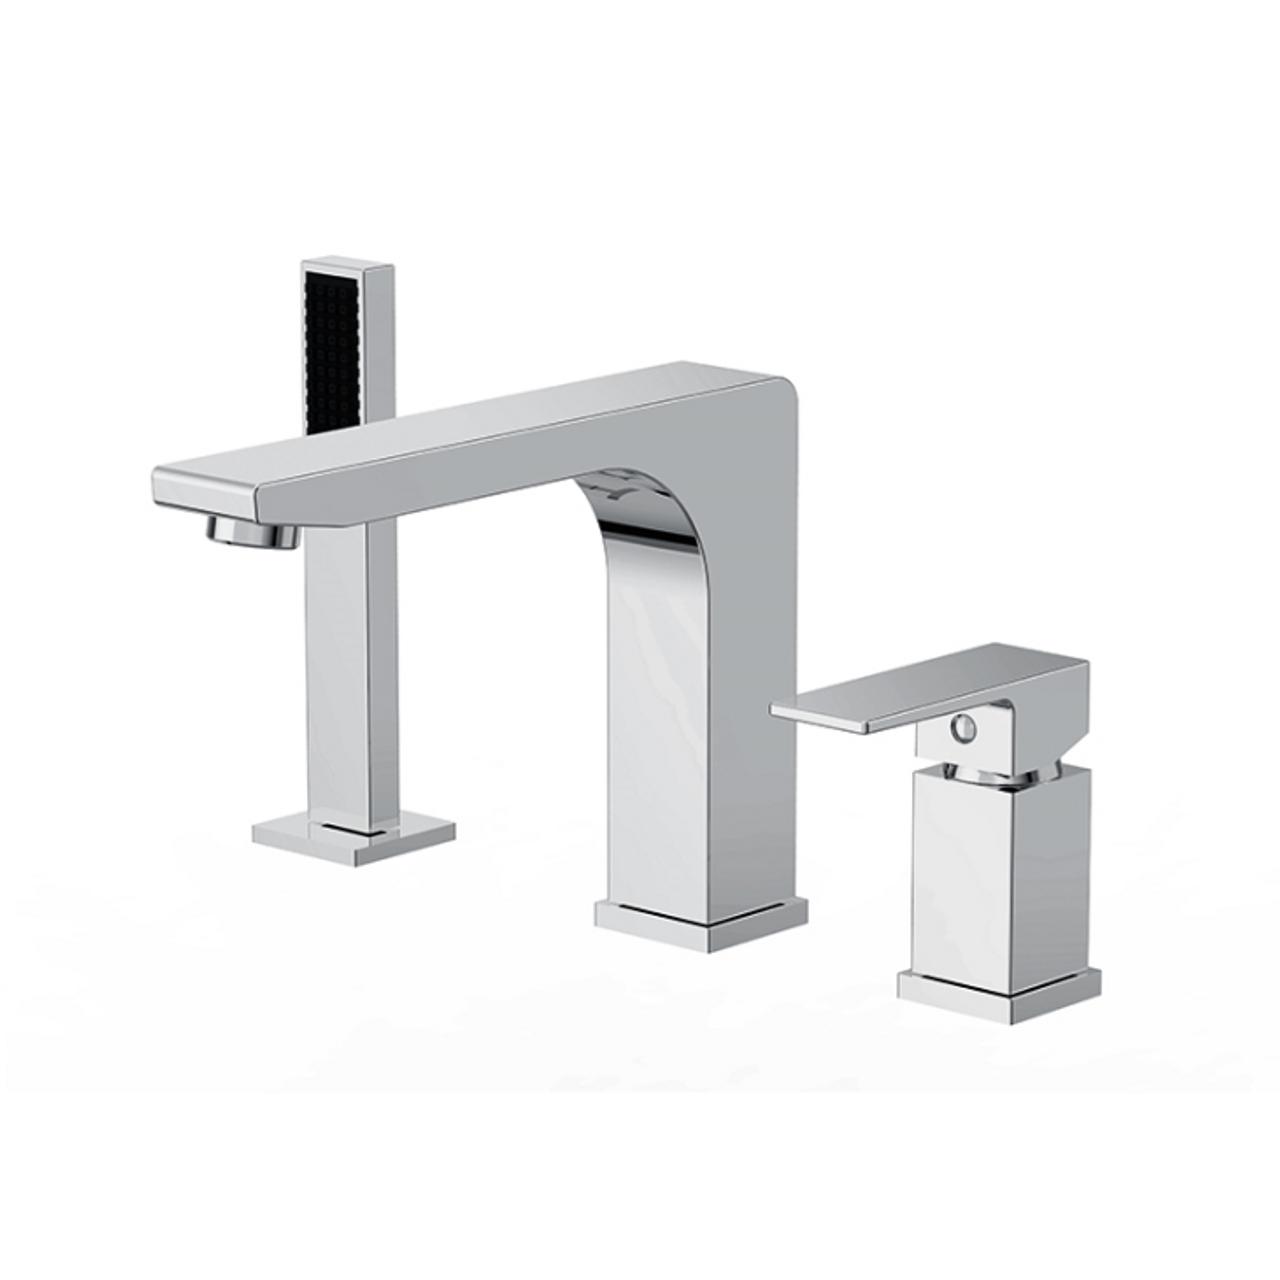 Royal Modern Roman Bath Brass Deck Mount Faucet With Hand Shower 3 - Roman-bathtub-for-royal-bath